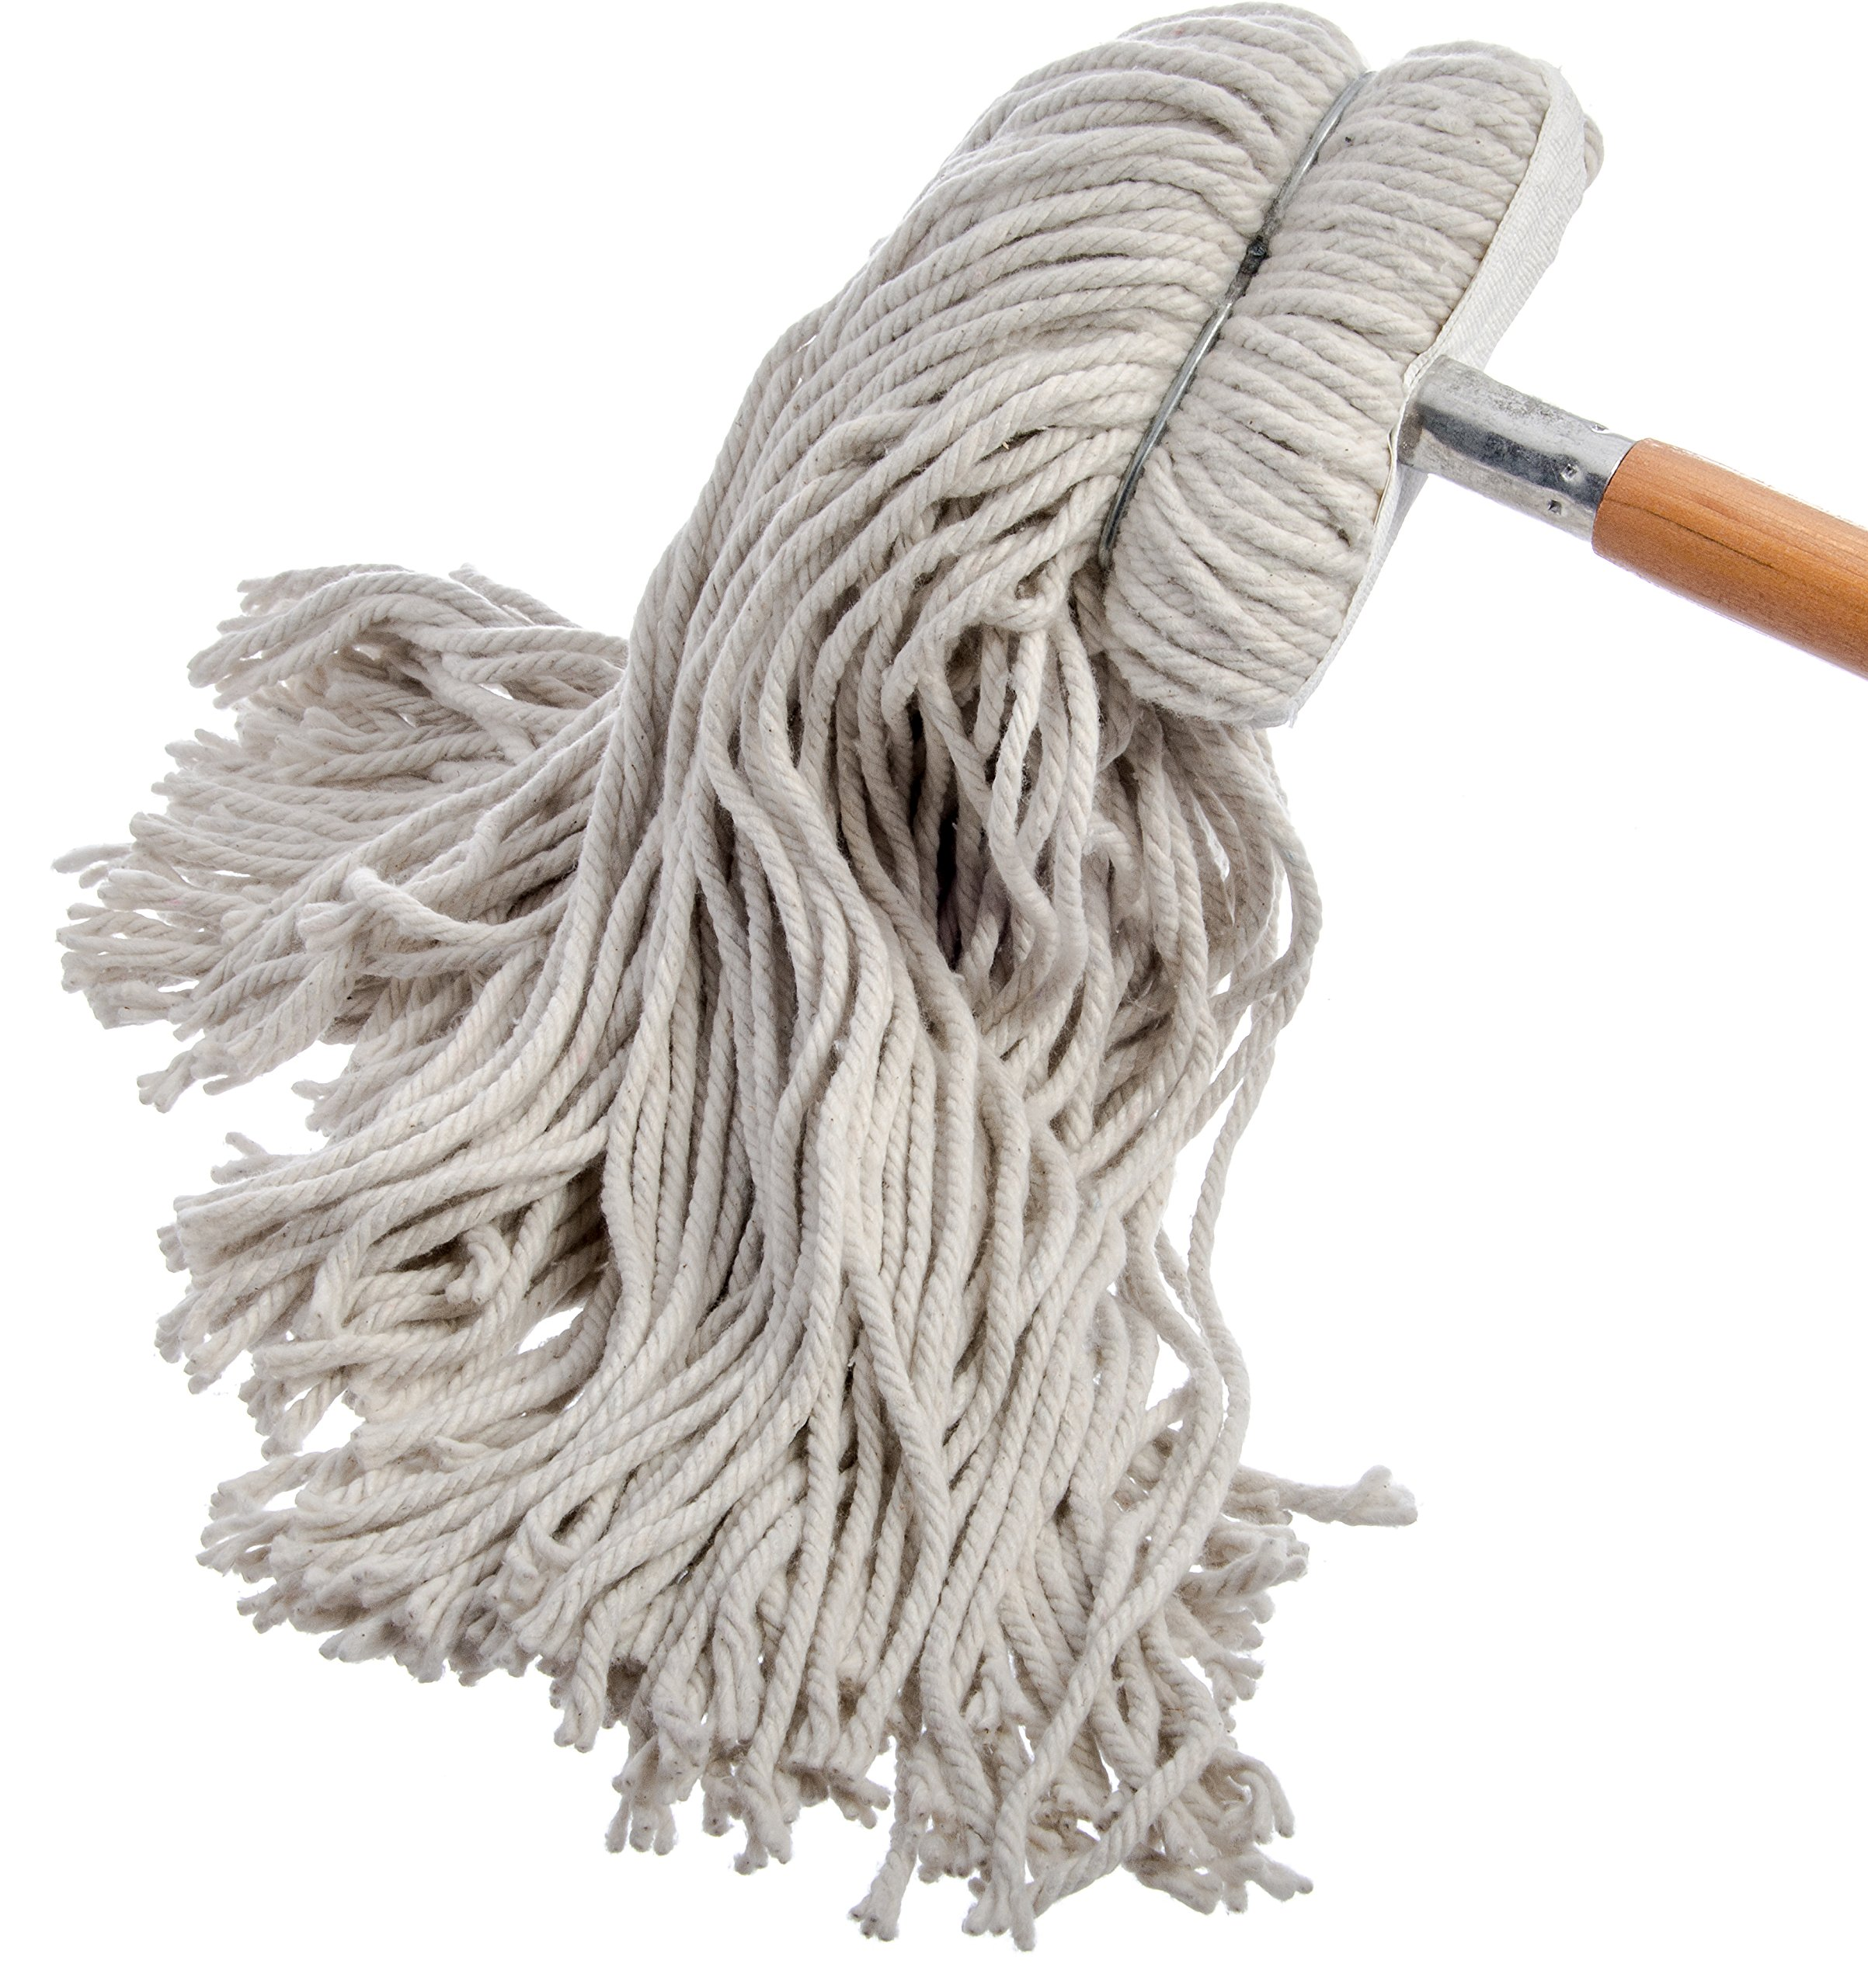 Carlisle 369024C00 Flo-Pac Kwik-On #24 Cotton Screw Top Cut-End Wet Mop, 18'' Length (Pack of 12) by Carlisle (Image #4)